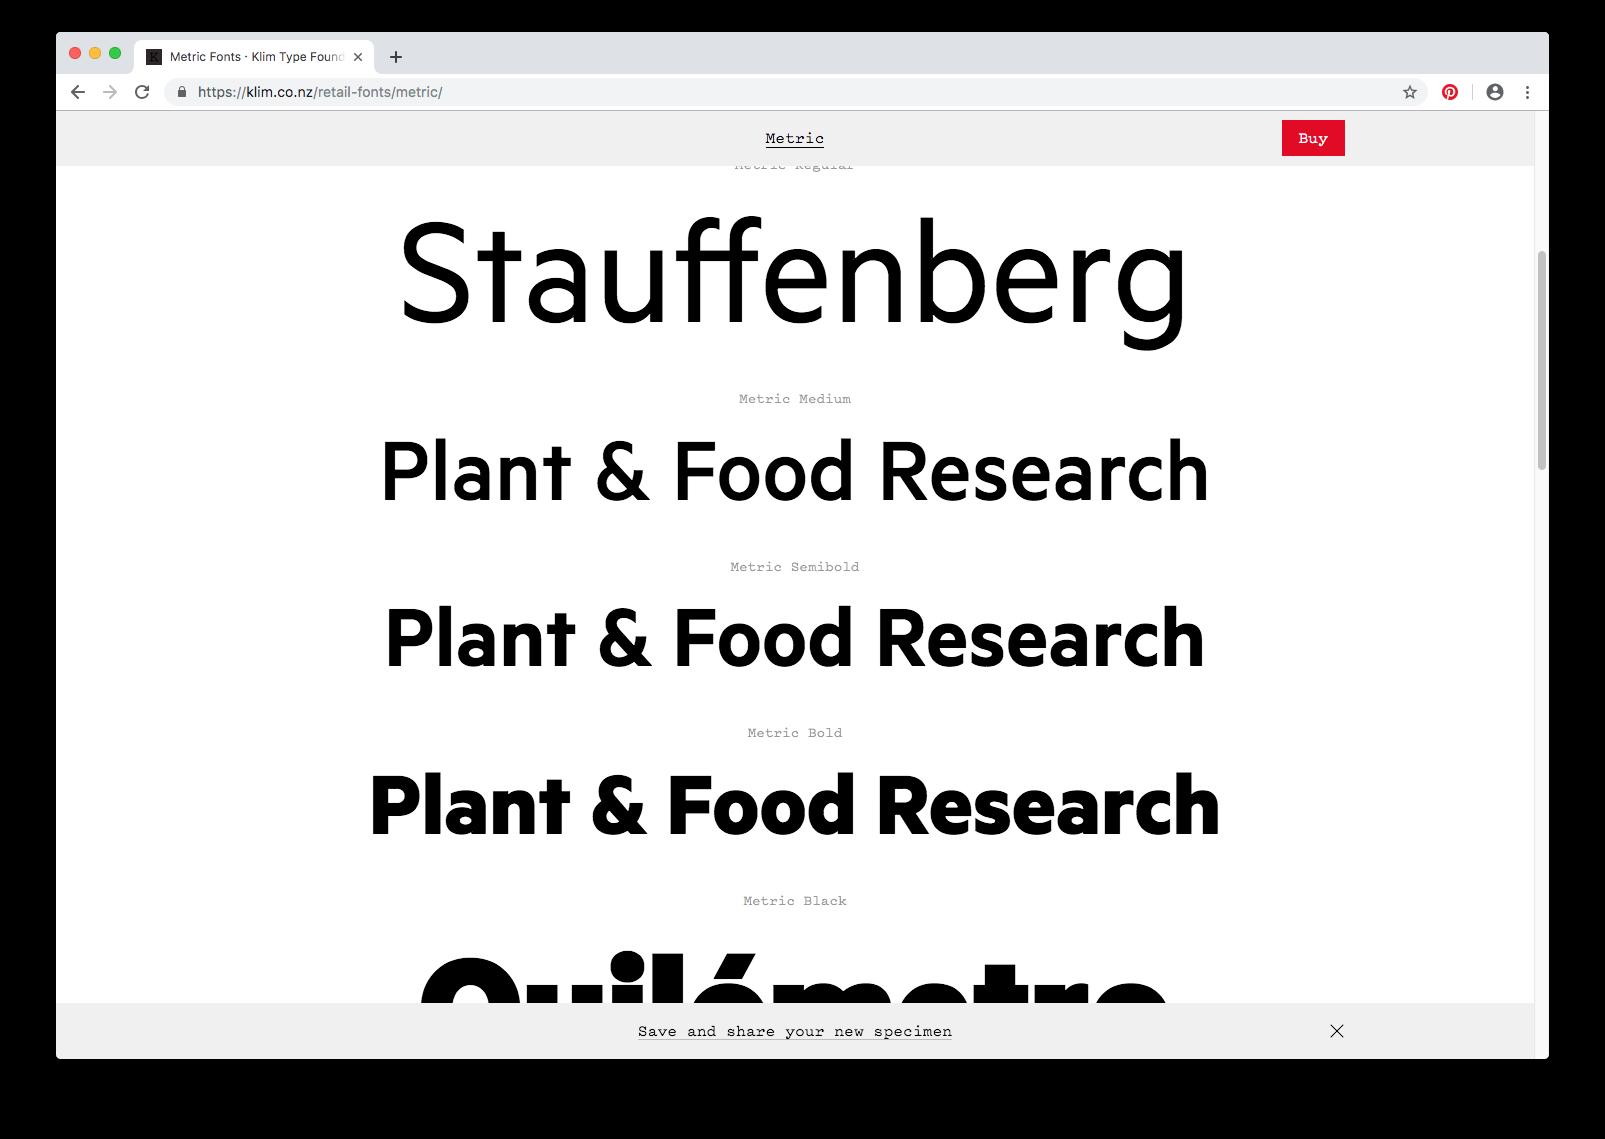 Pin by minna pesonen on PFR brand Math, Plant food, Math